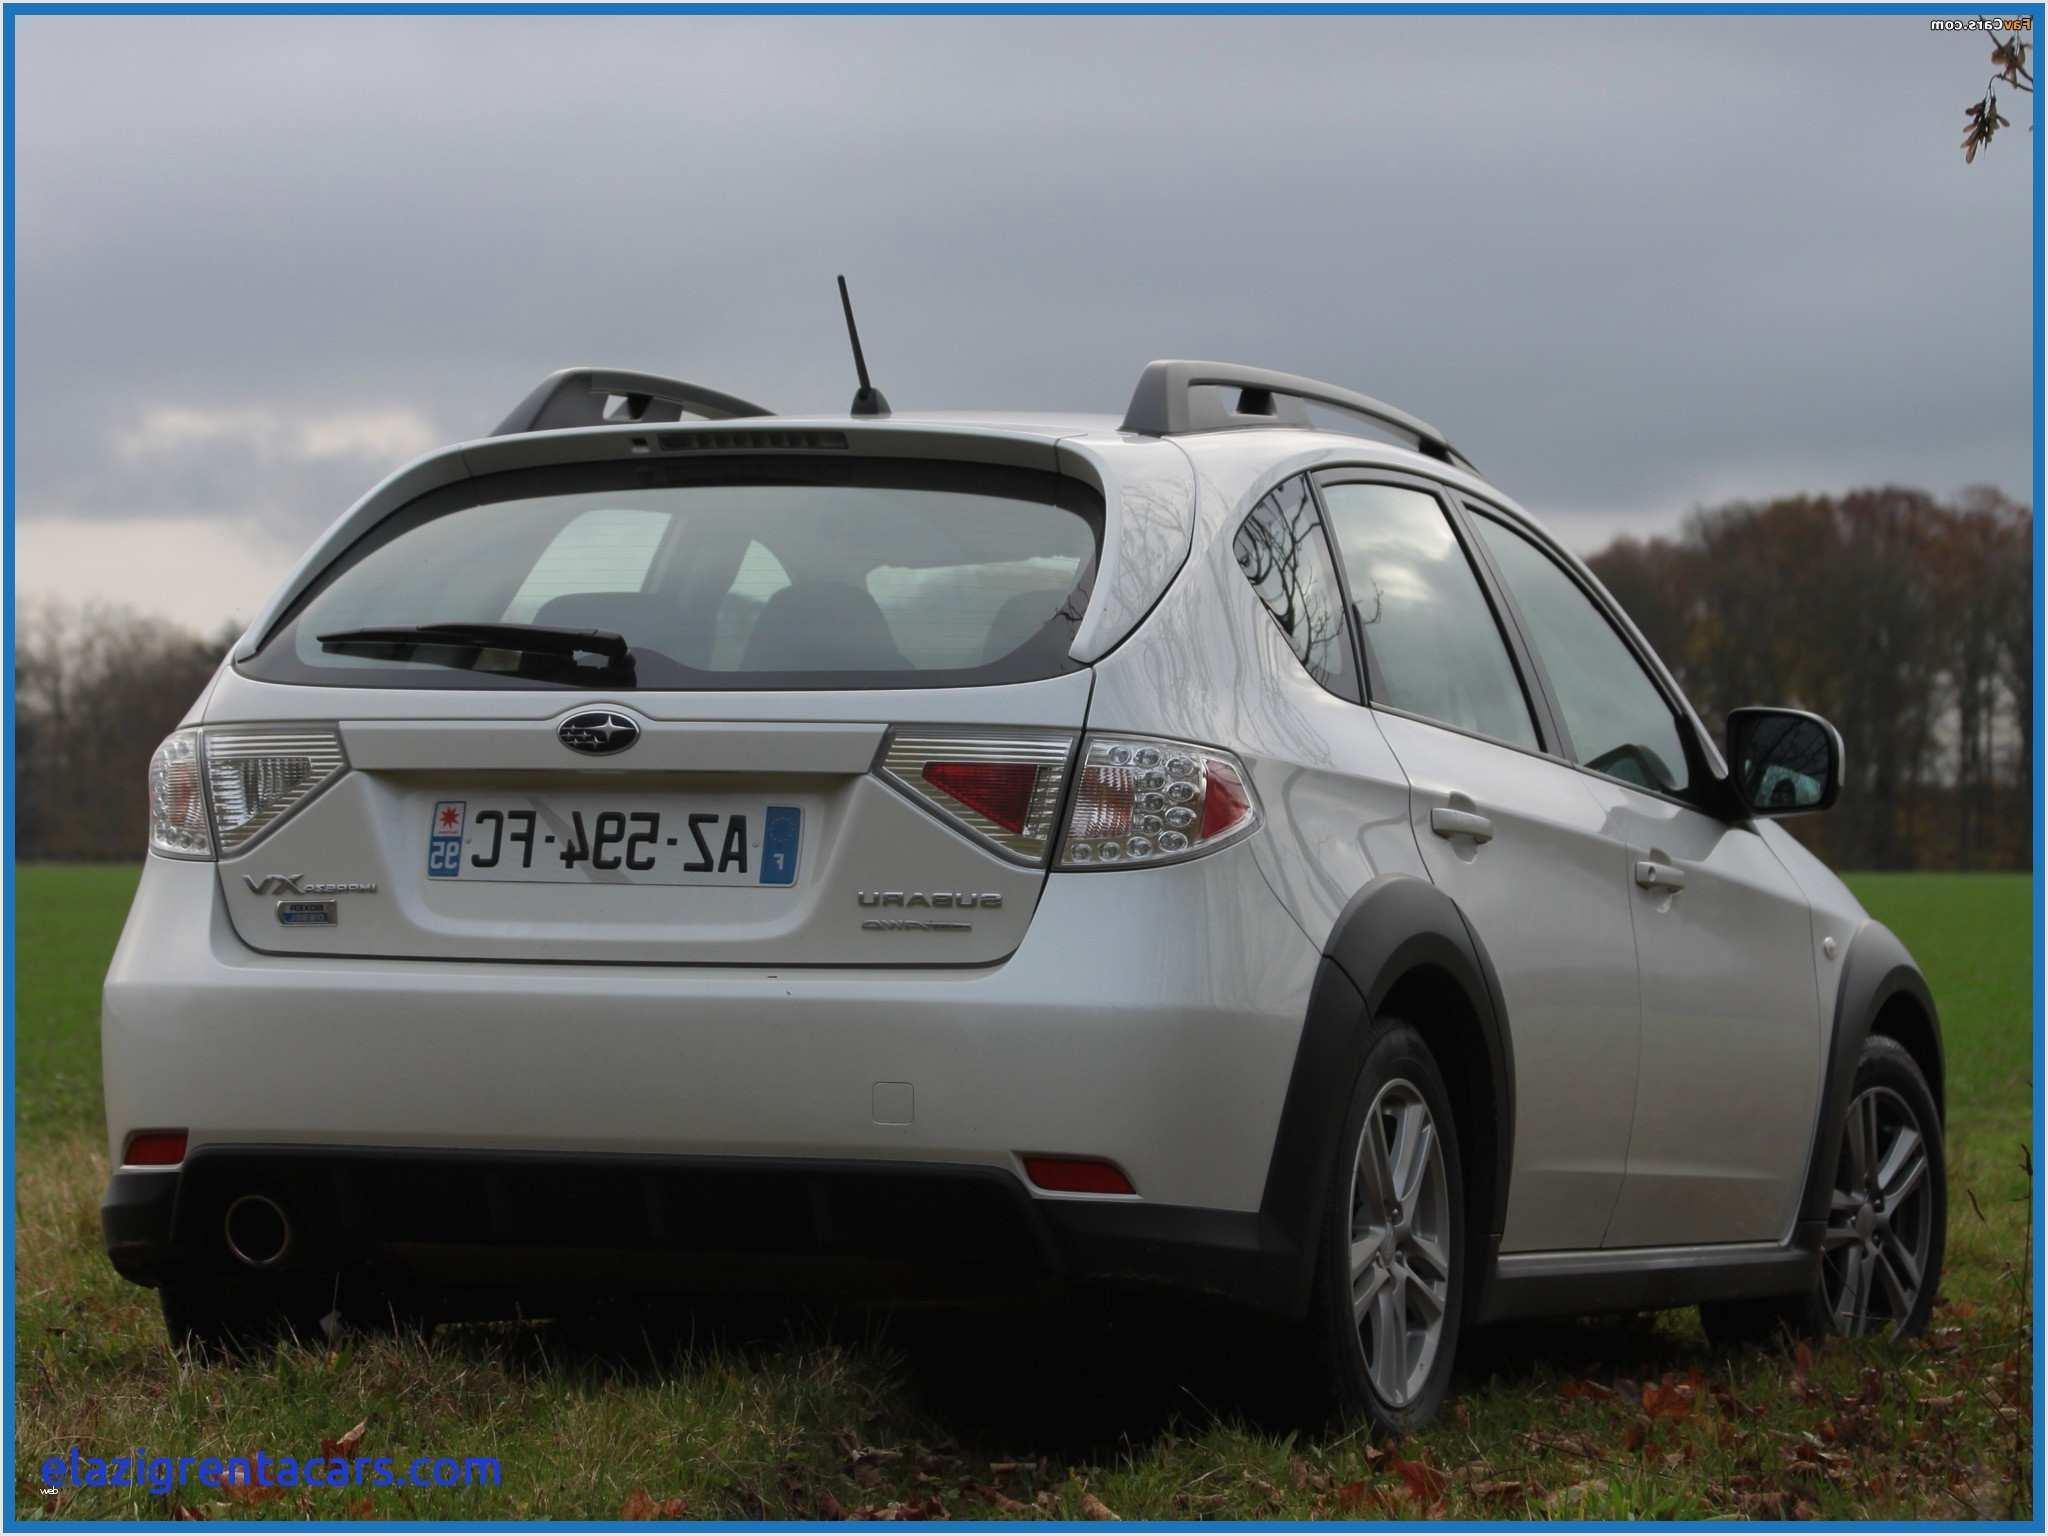 51 New The Subaru Sti Wagon 2019 Specs And Review Pricing by The Subaru Sti Wagon 2019 Specs And Review